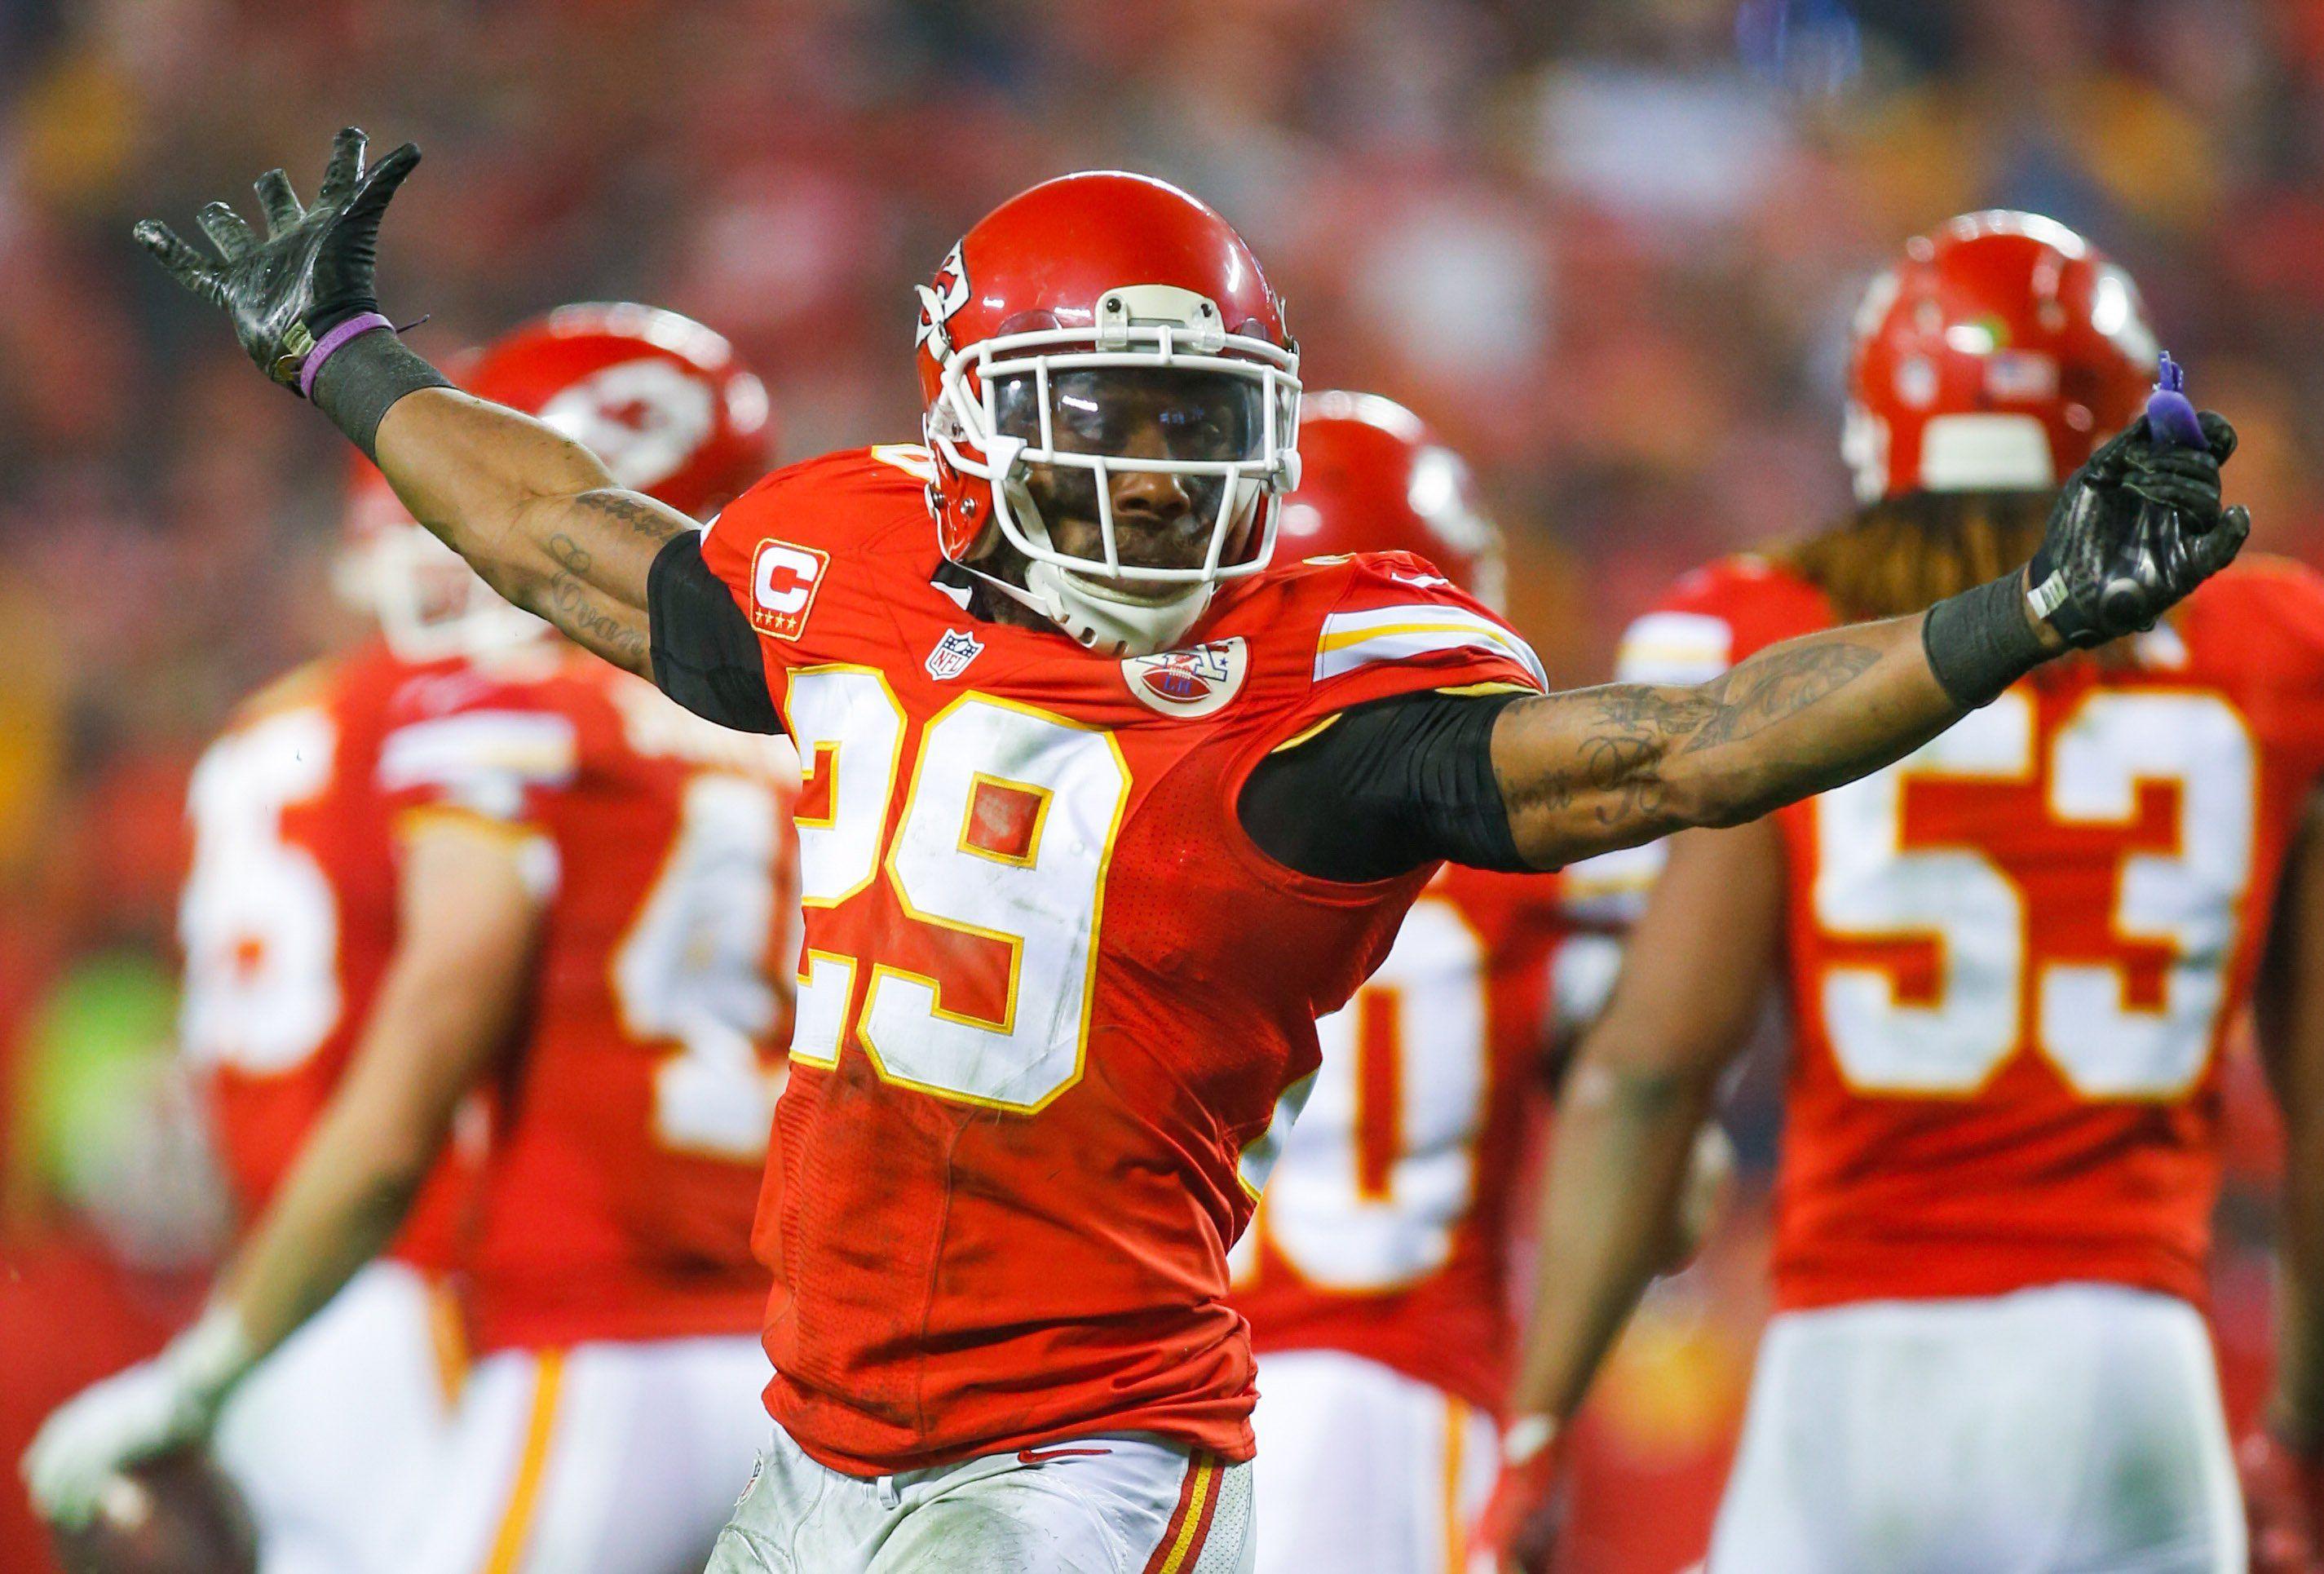 NFL Predictions WinLoss Ratio for Chiefs, Raiders